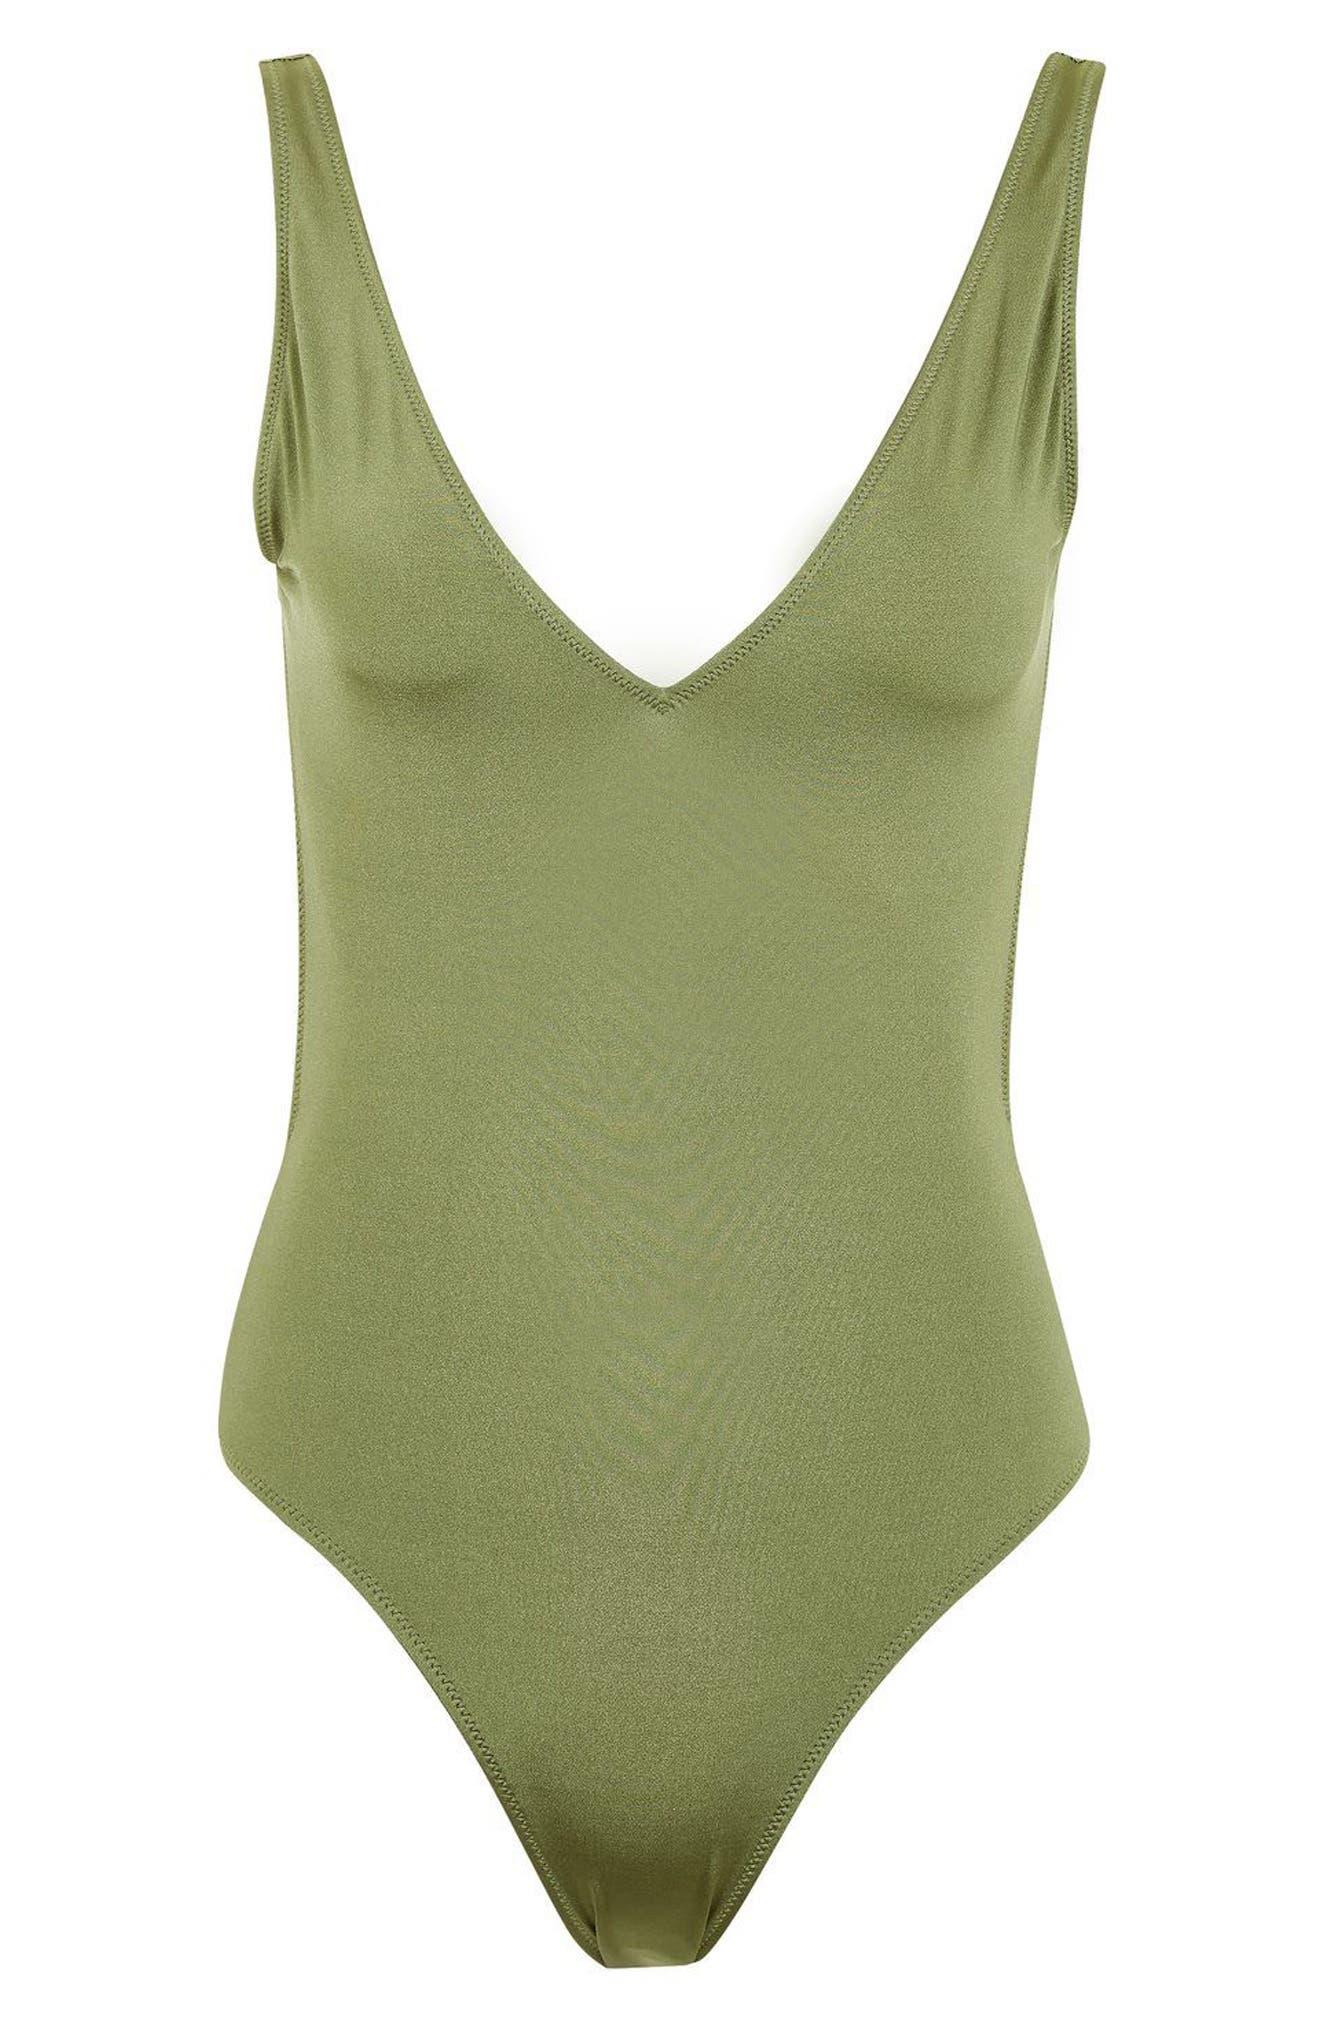 Topshop Pamela One-Piece Swimsuit